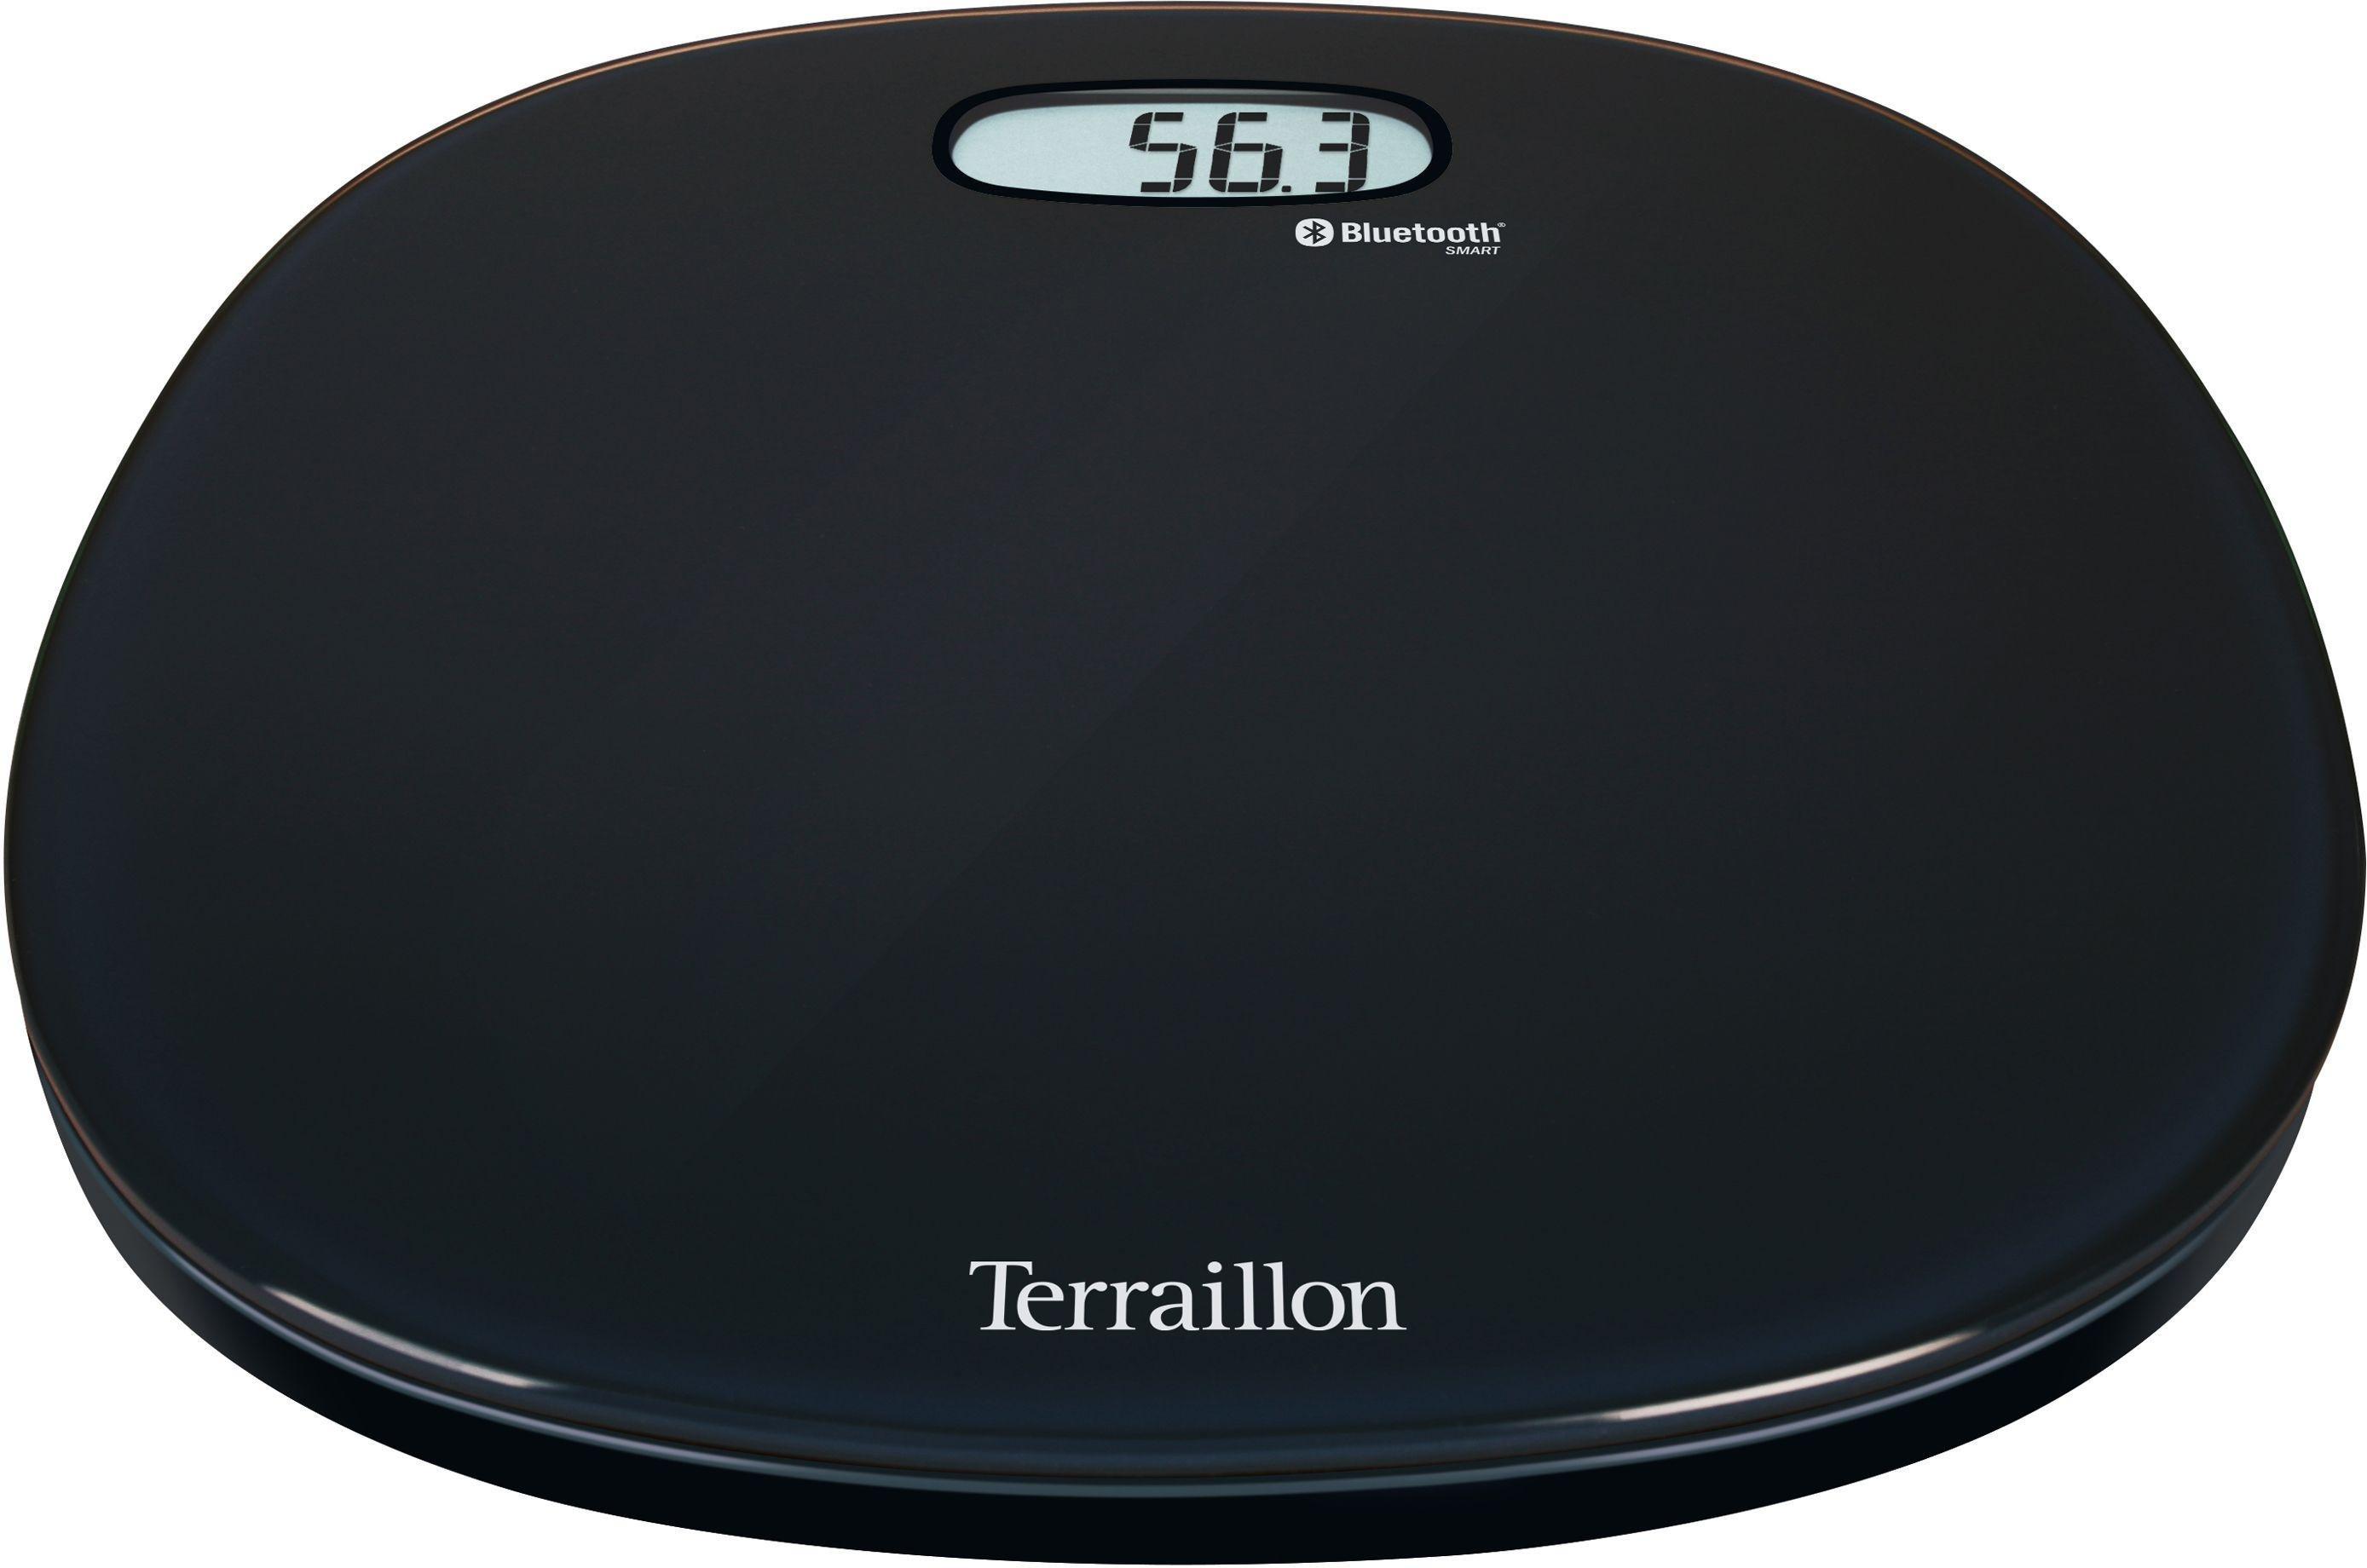 Terraillon - Web Coach One Black Body Analyser Bathroom Scale